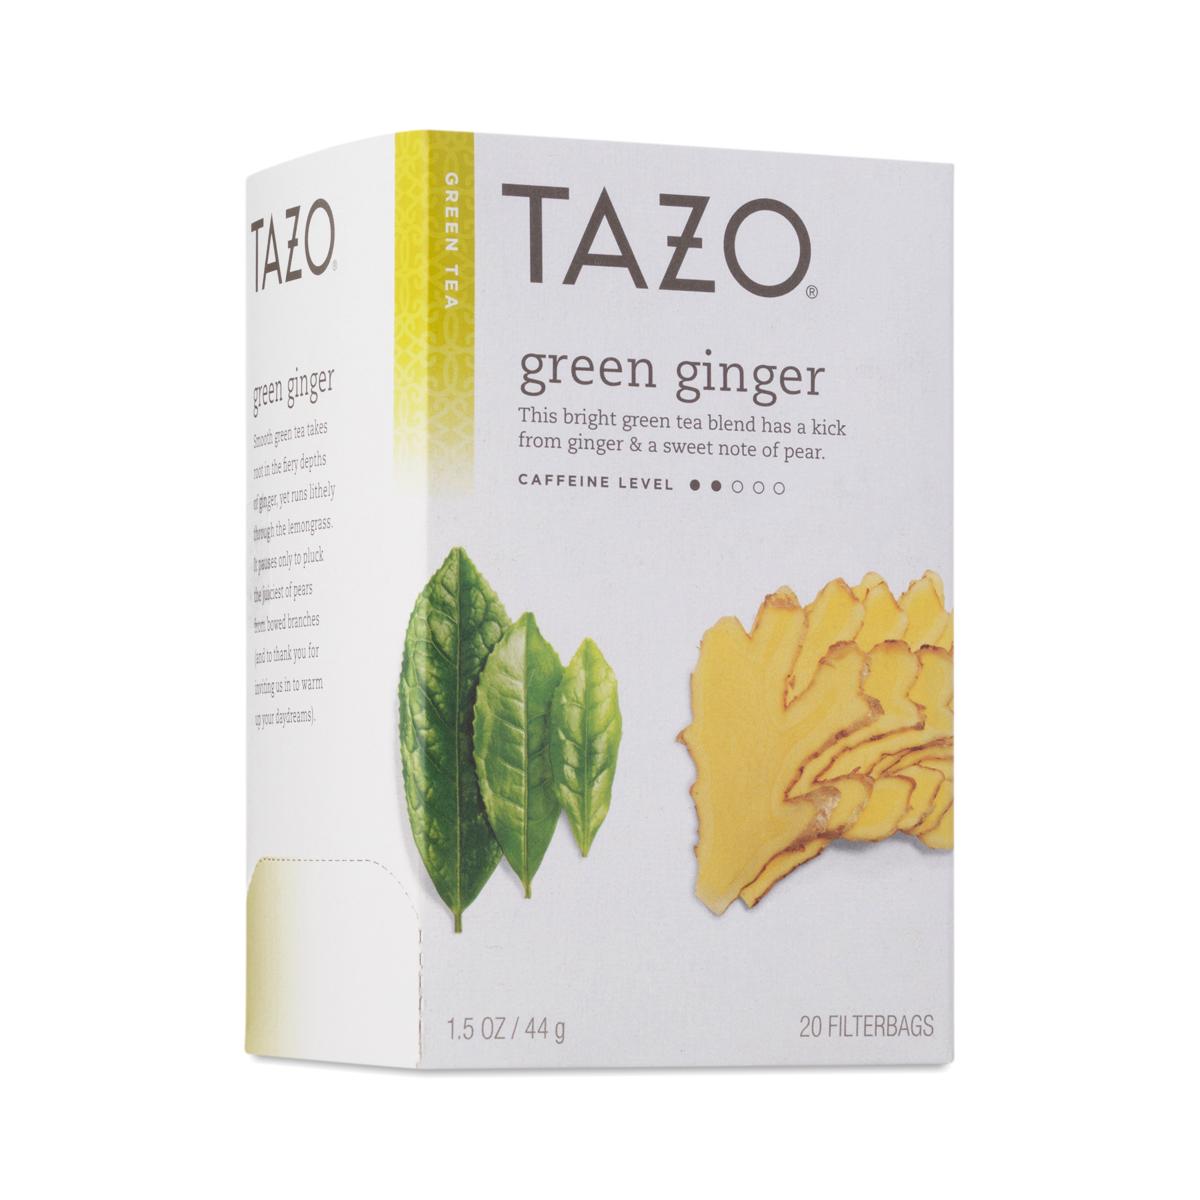 Tazo green tea ingredients